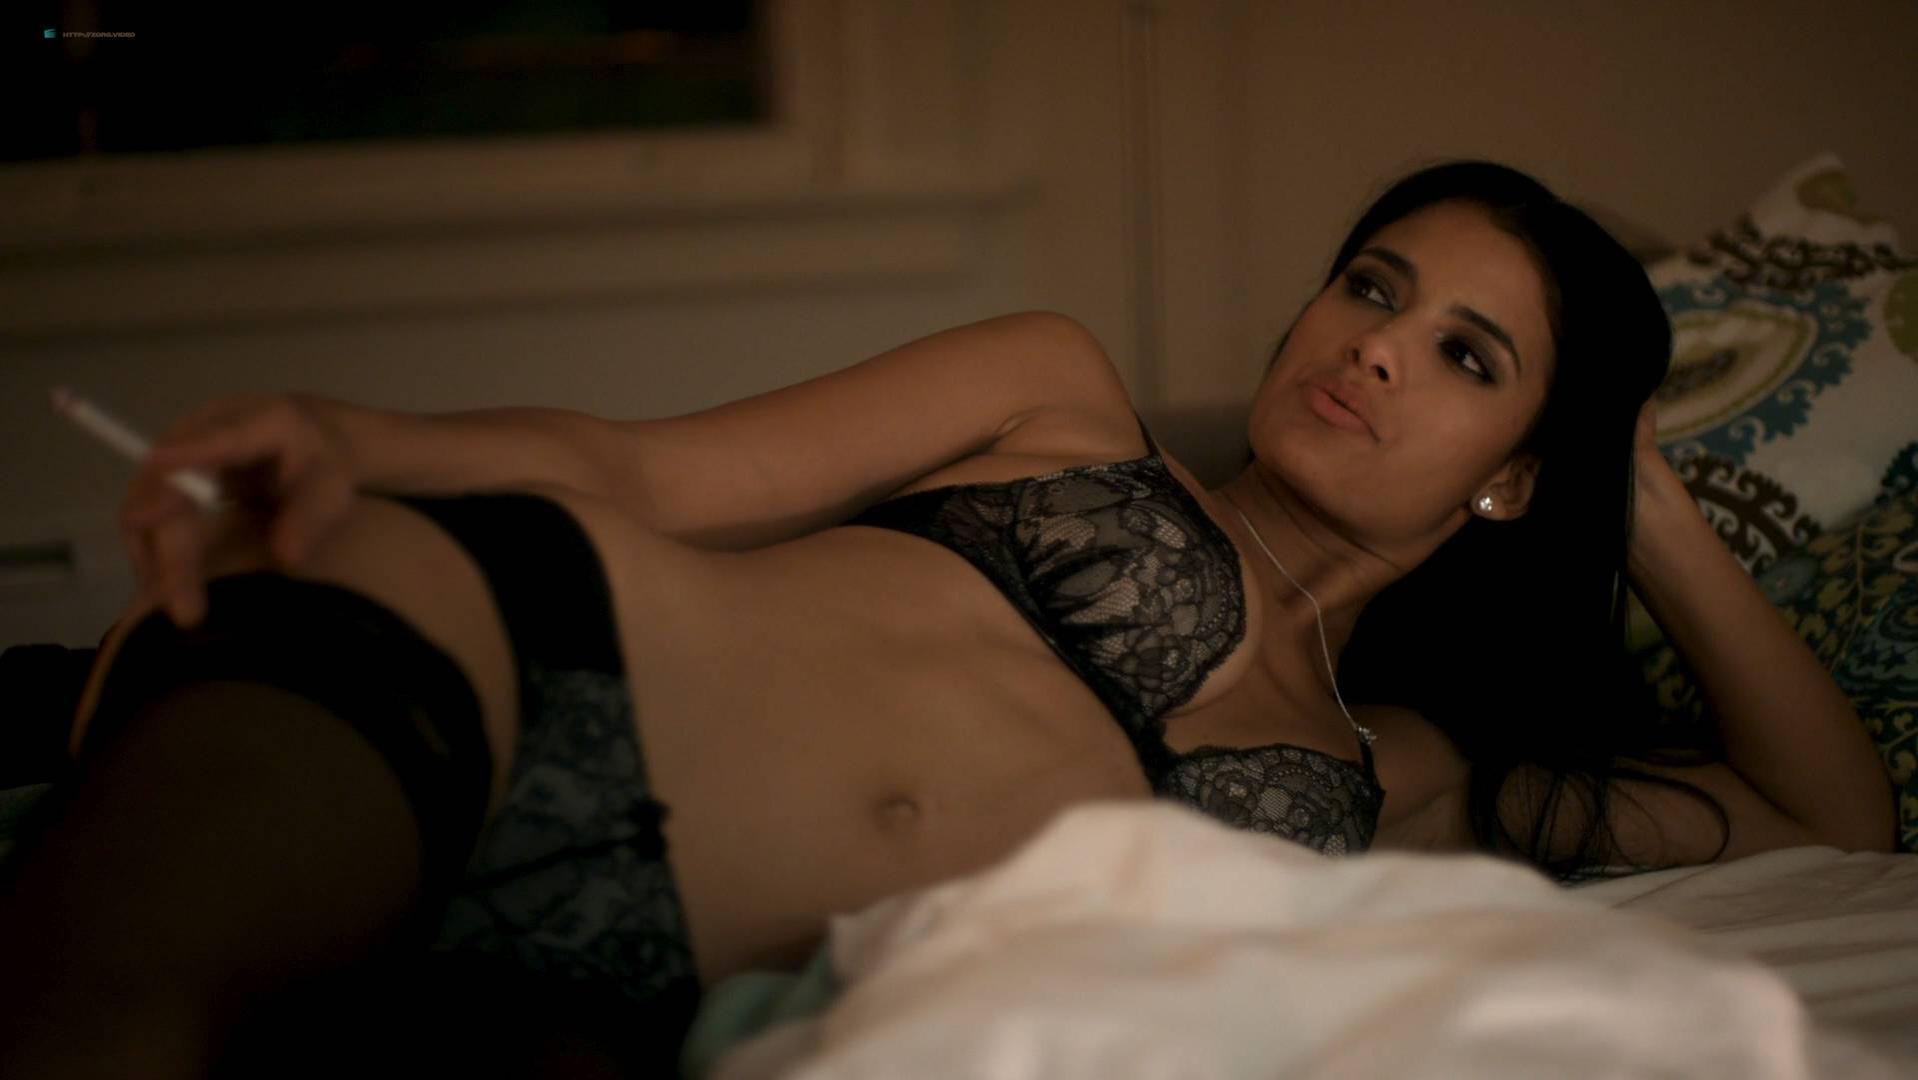 Jessica Clark sexy, Jenna Haze nude, Claudia Fijal nude - Pocket Listing (2015)